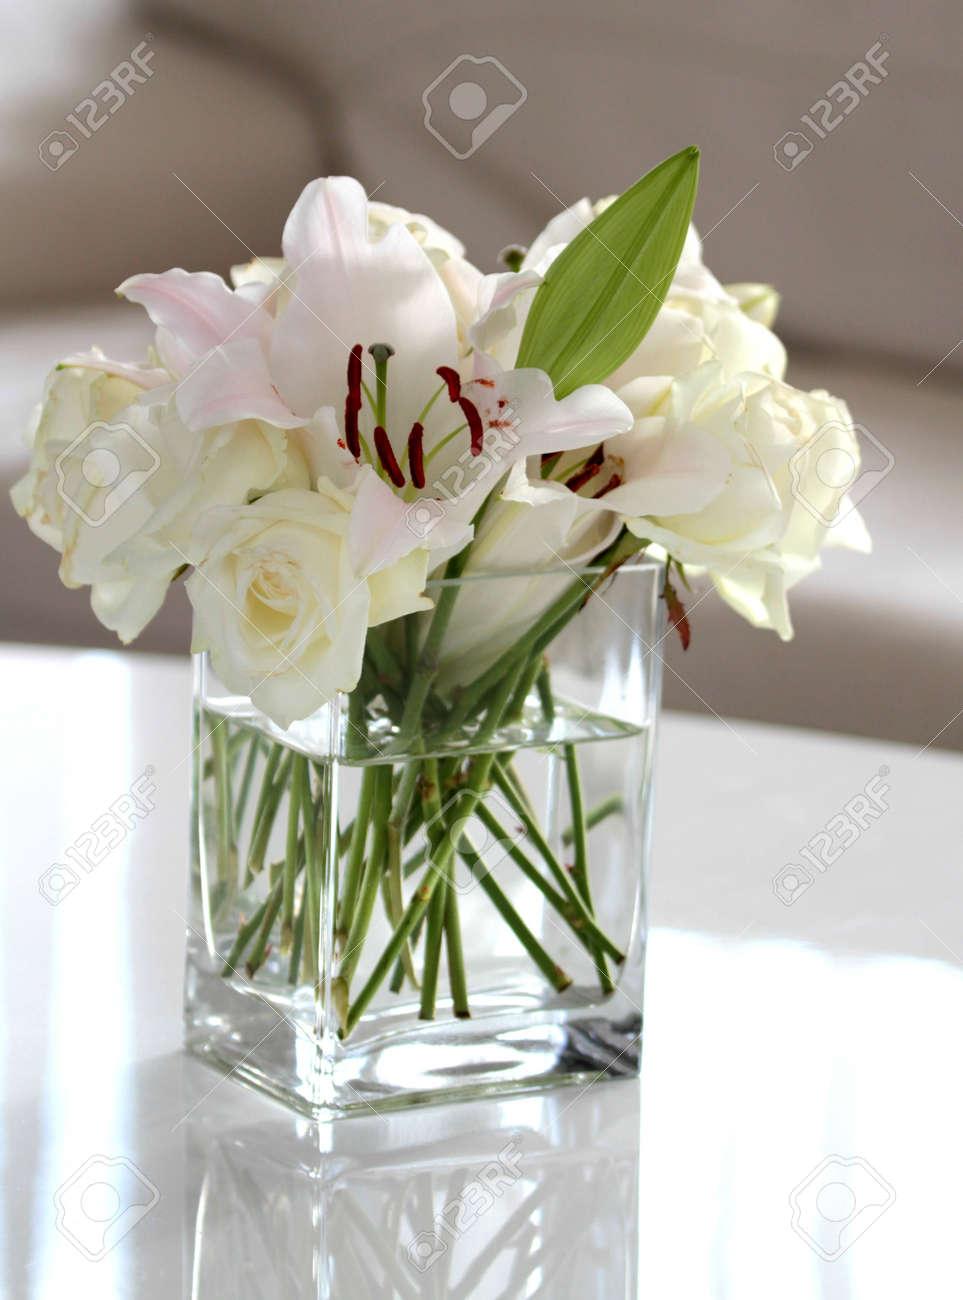 Вазы под цветы